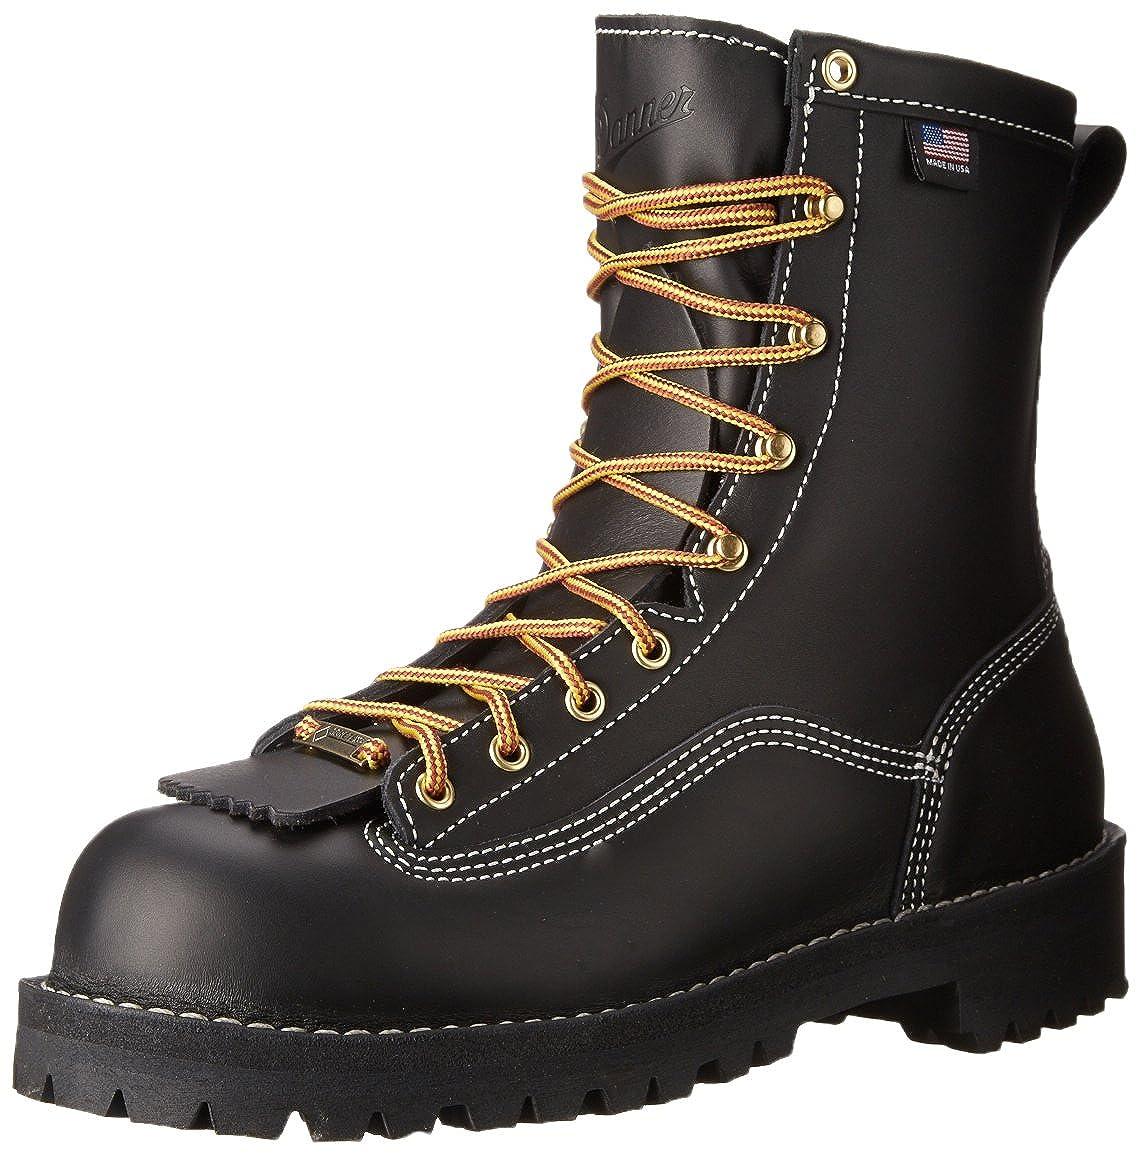 55b17c162d5 Danner Men's Super Rain Forest 8 Inch Work Boot, Black, 7.5 D US ...